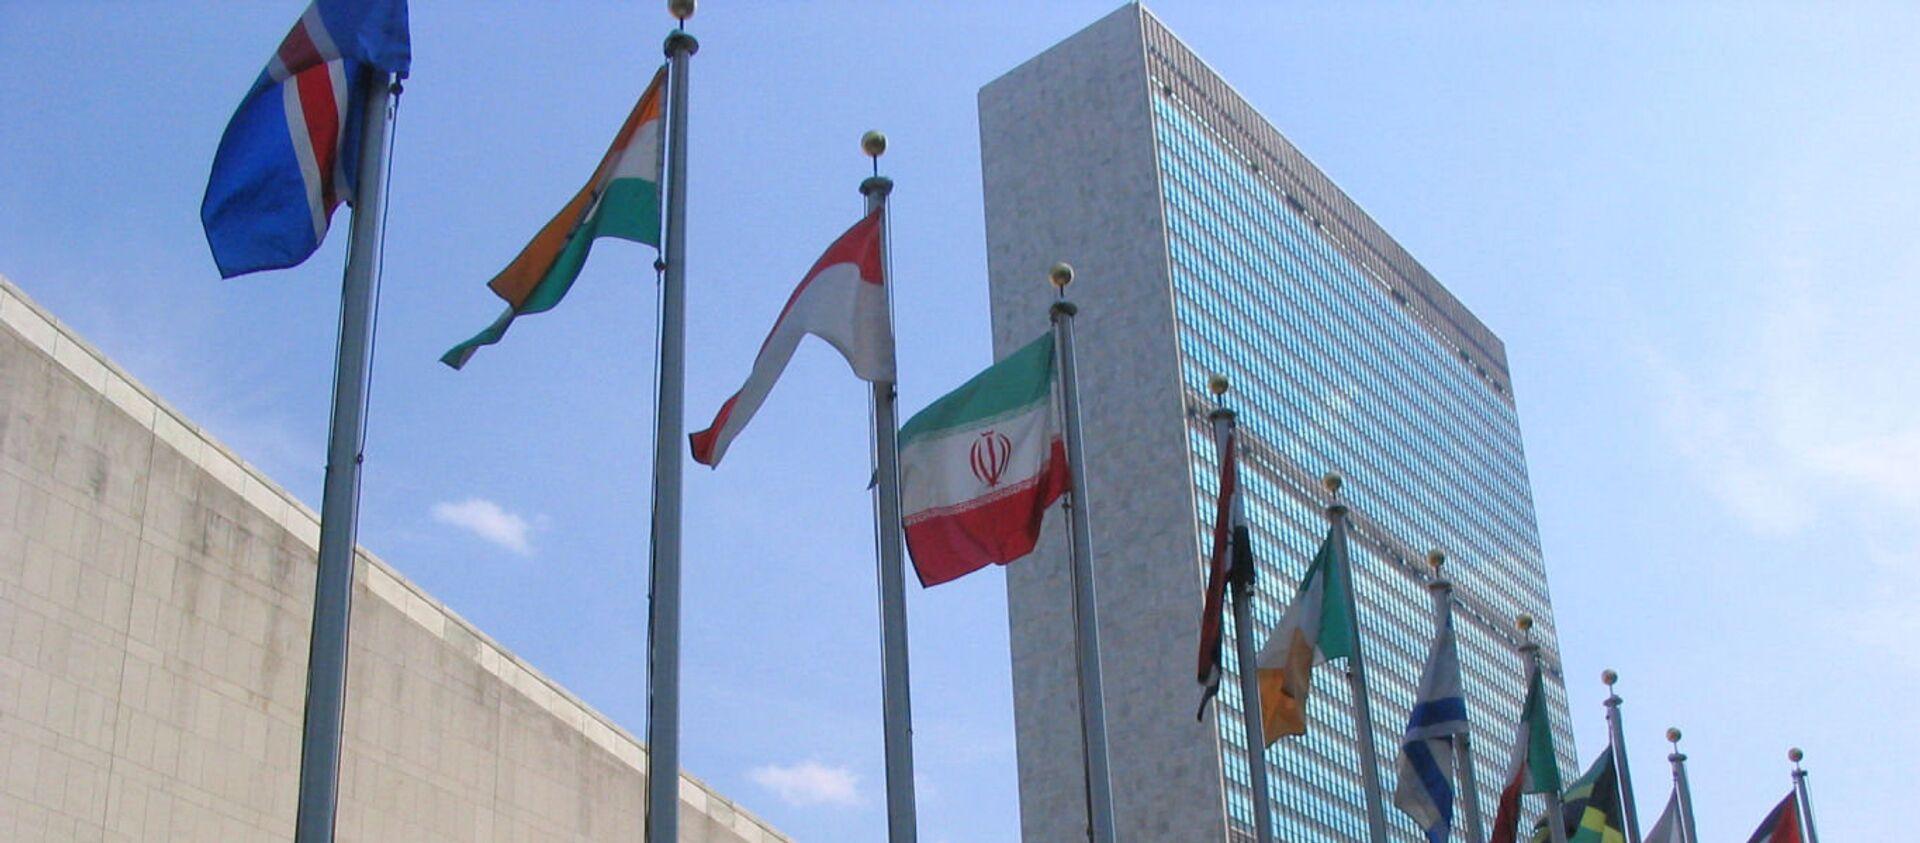 Le siège des Nations unies à New York - Sputnik France, 1920, 23.07.2020